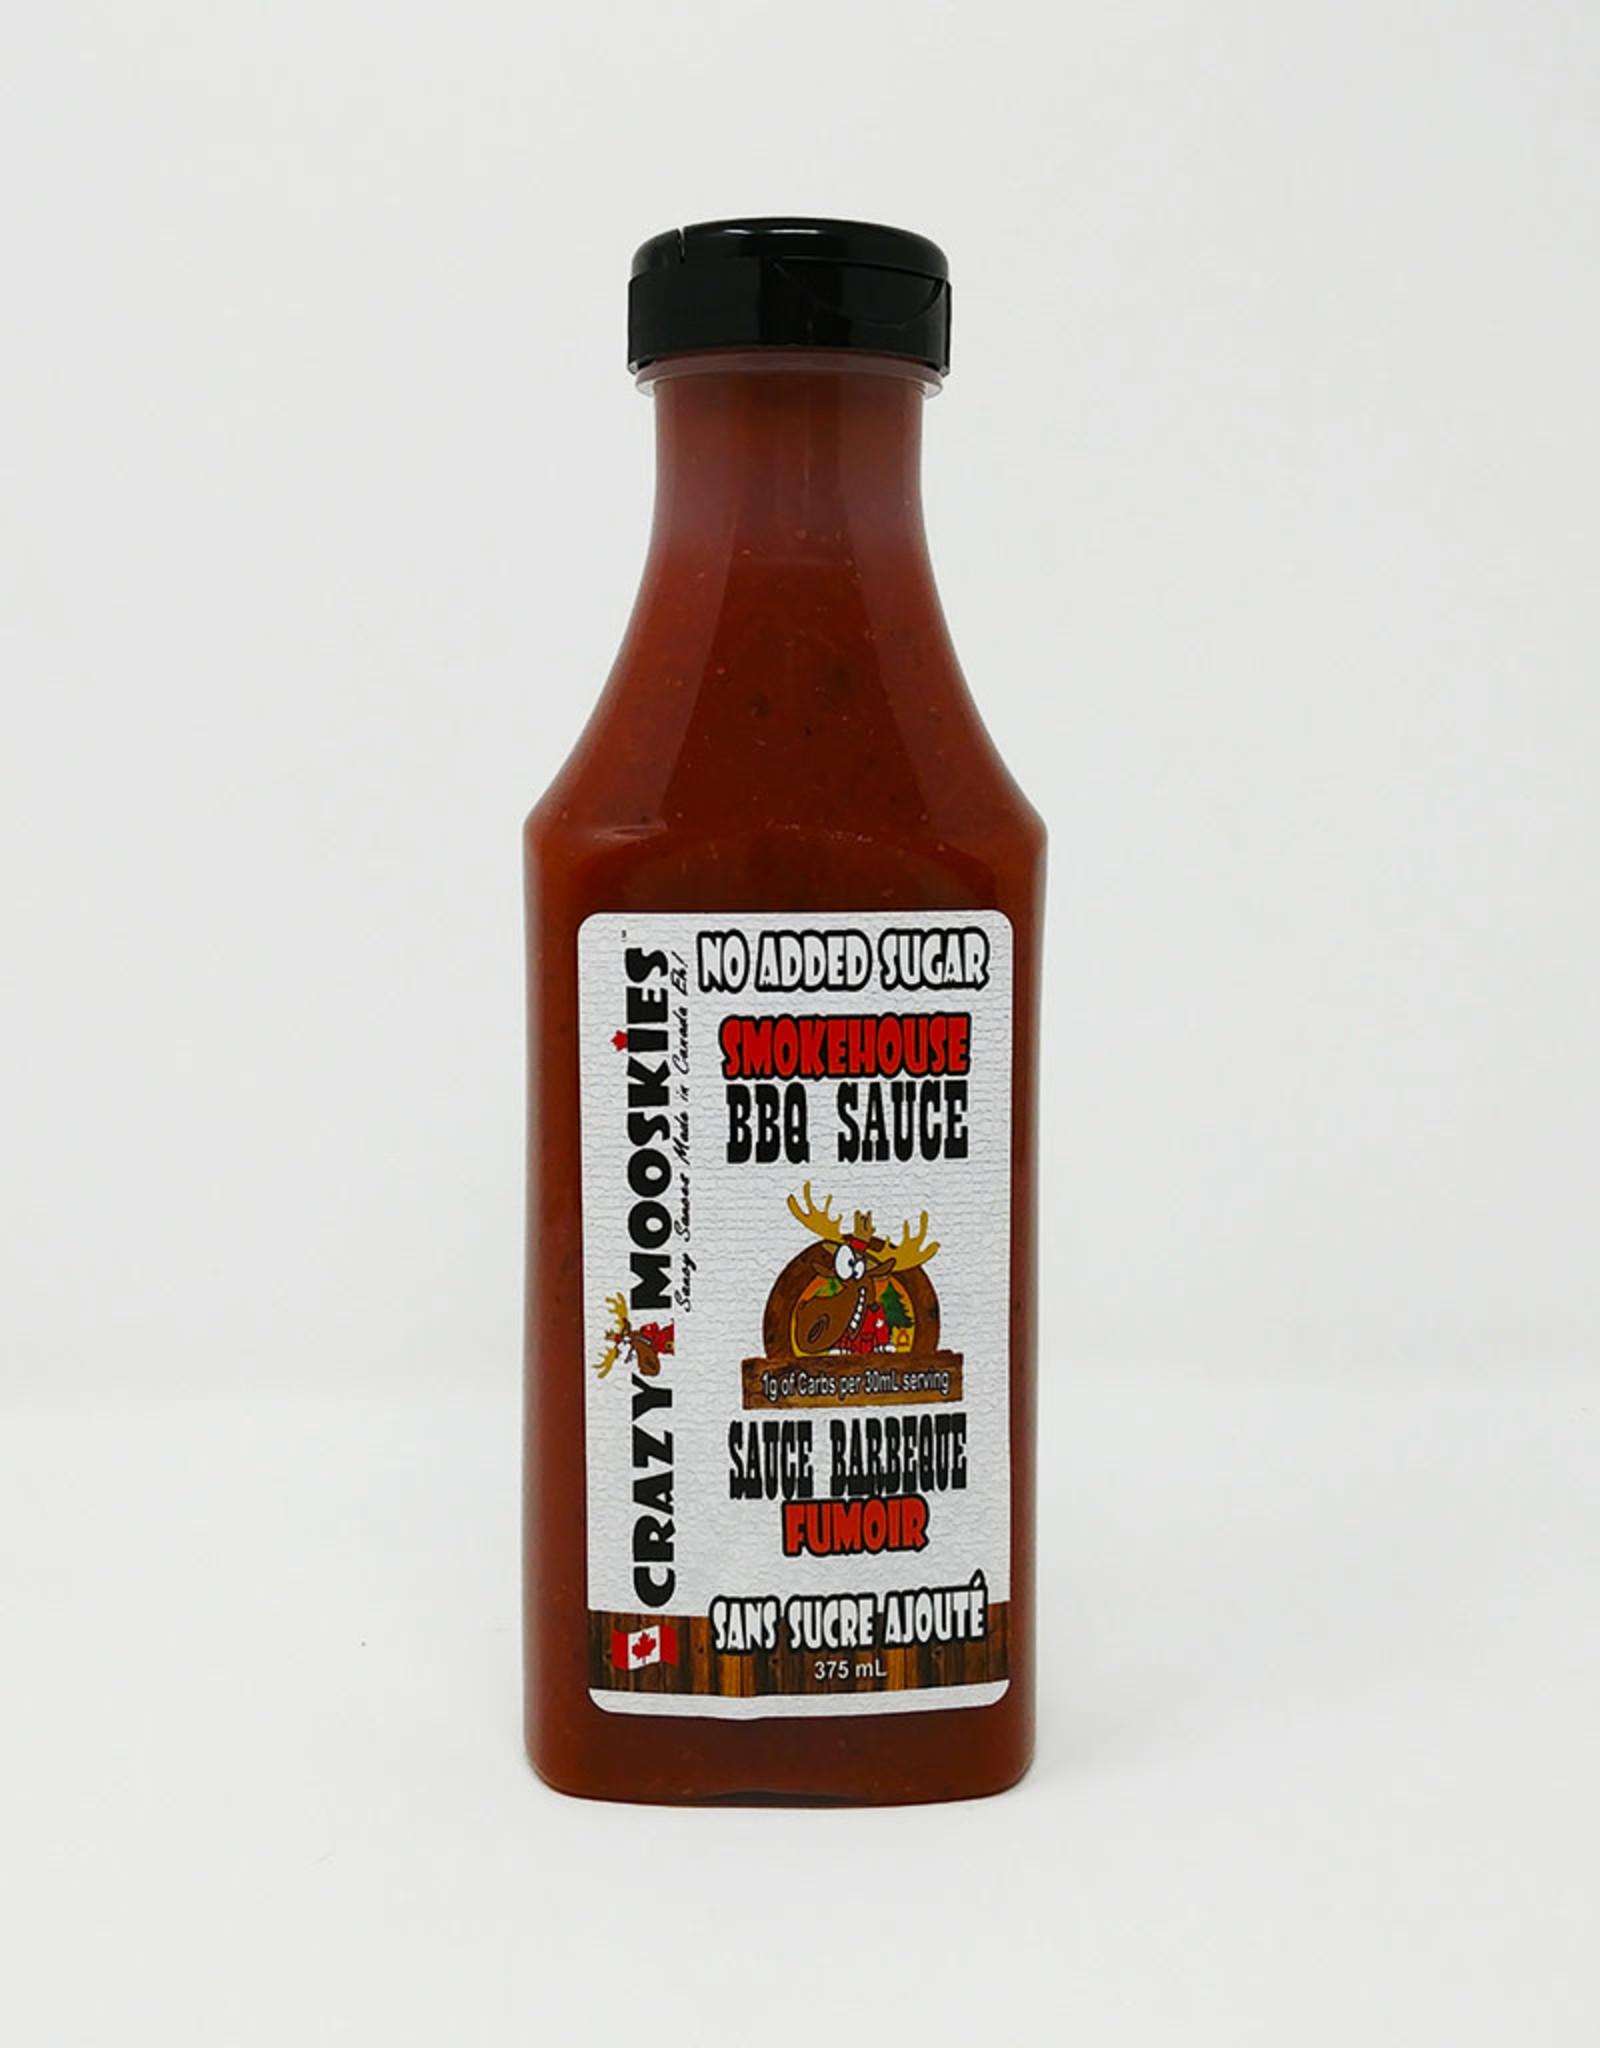 Crazy Mooskies Crazy Mooskies - No Sugar Added BBQ Sauce, Smokehouse (375ml)